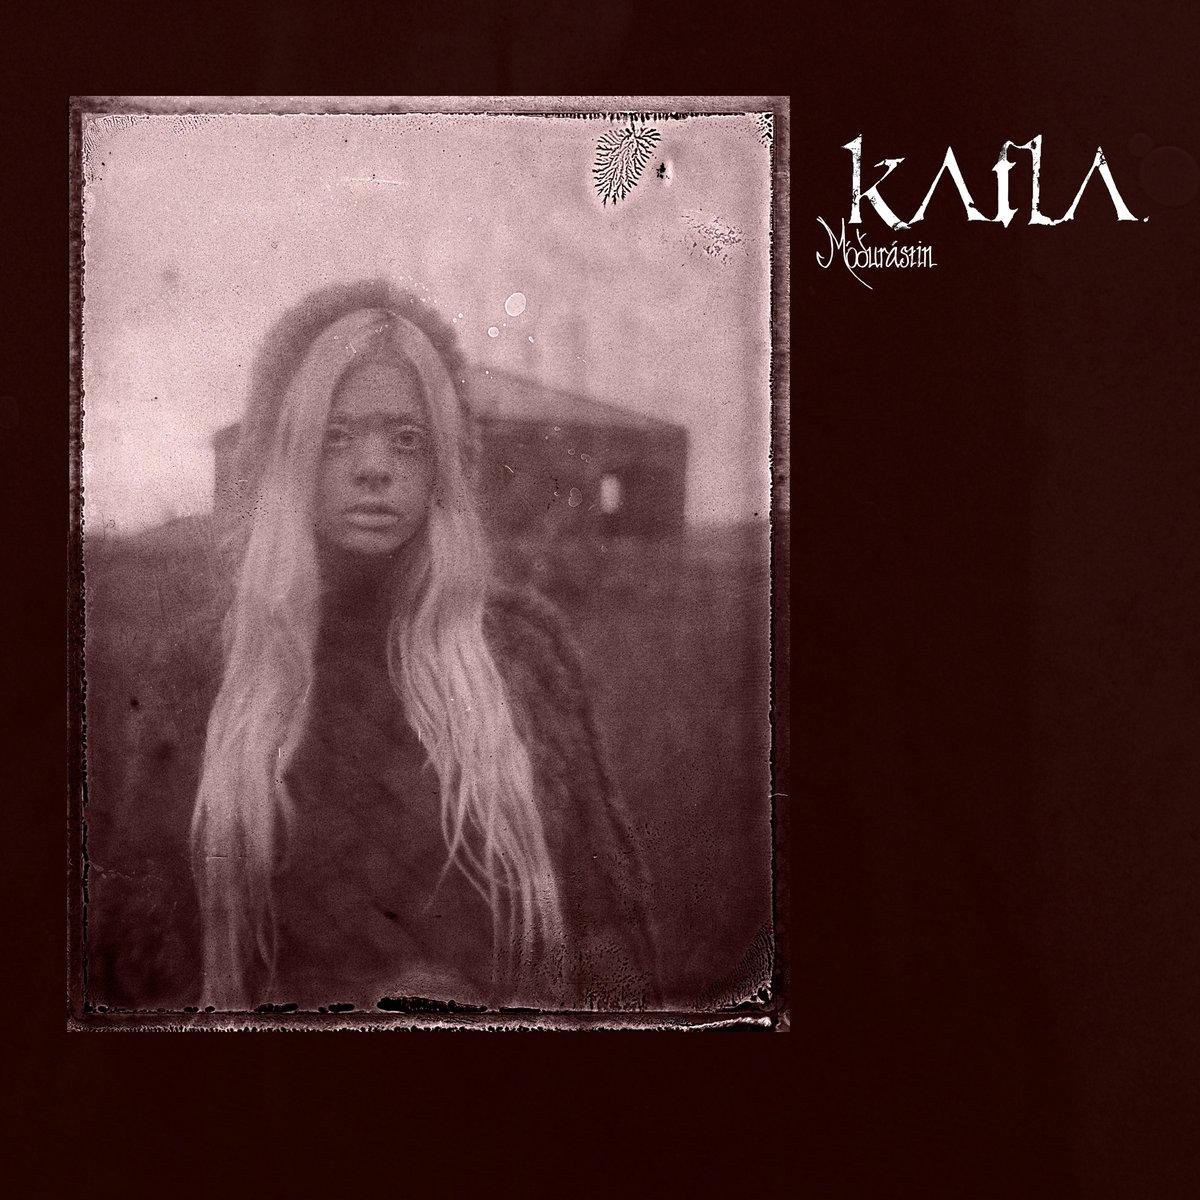 Oct – Katla